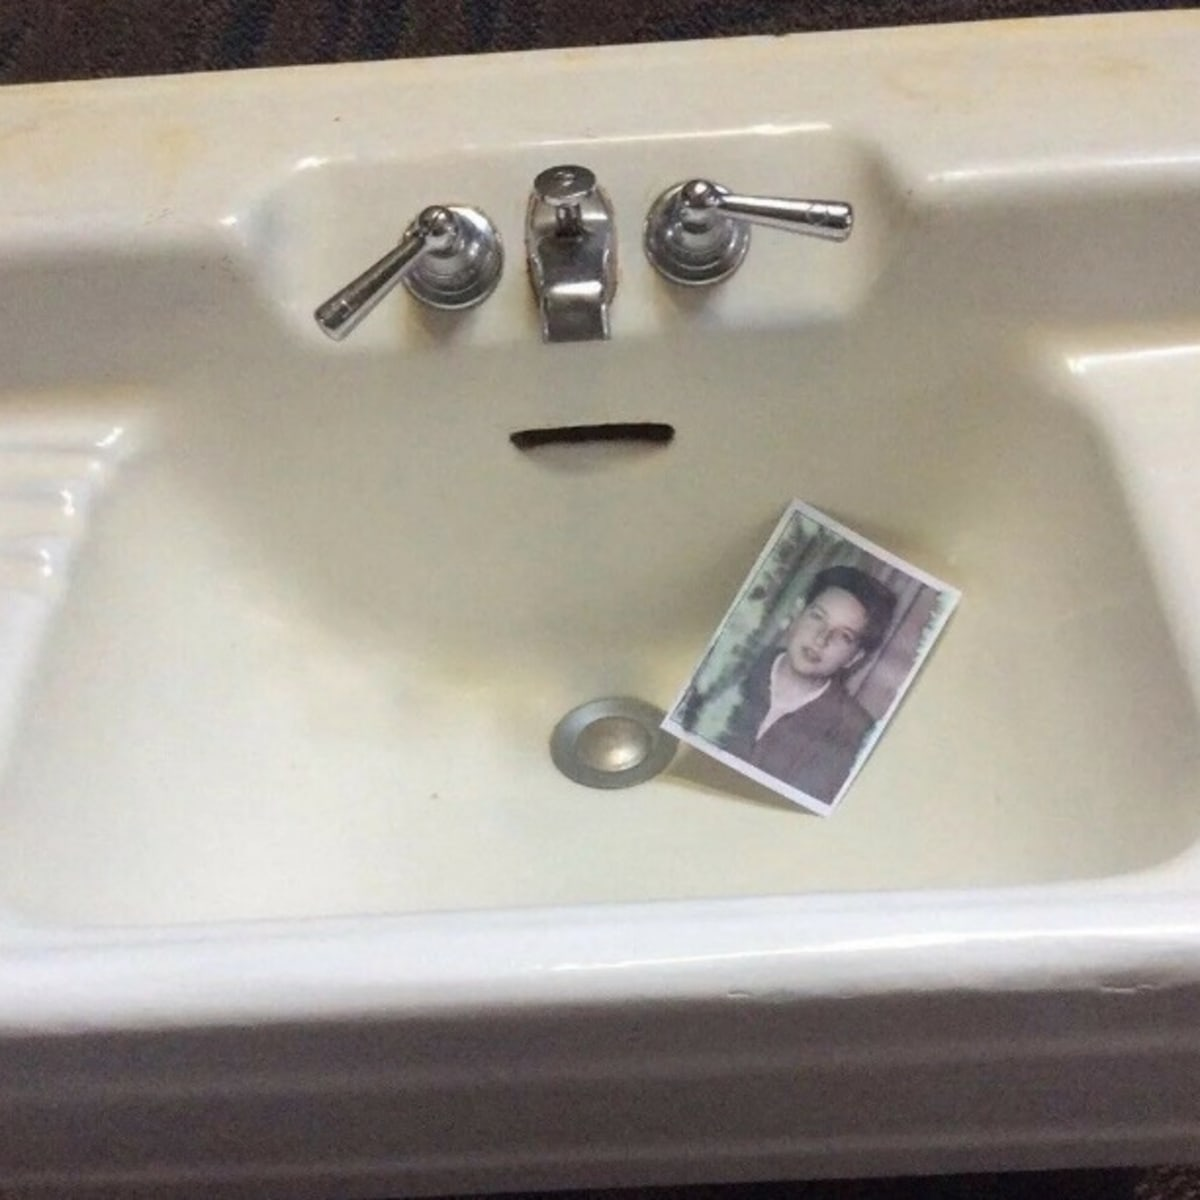 Bob Dylan S Childhood Bathroom Sink